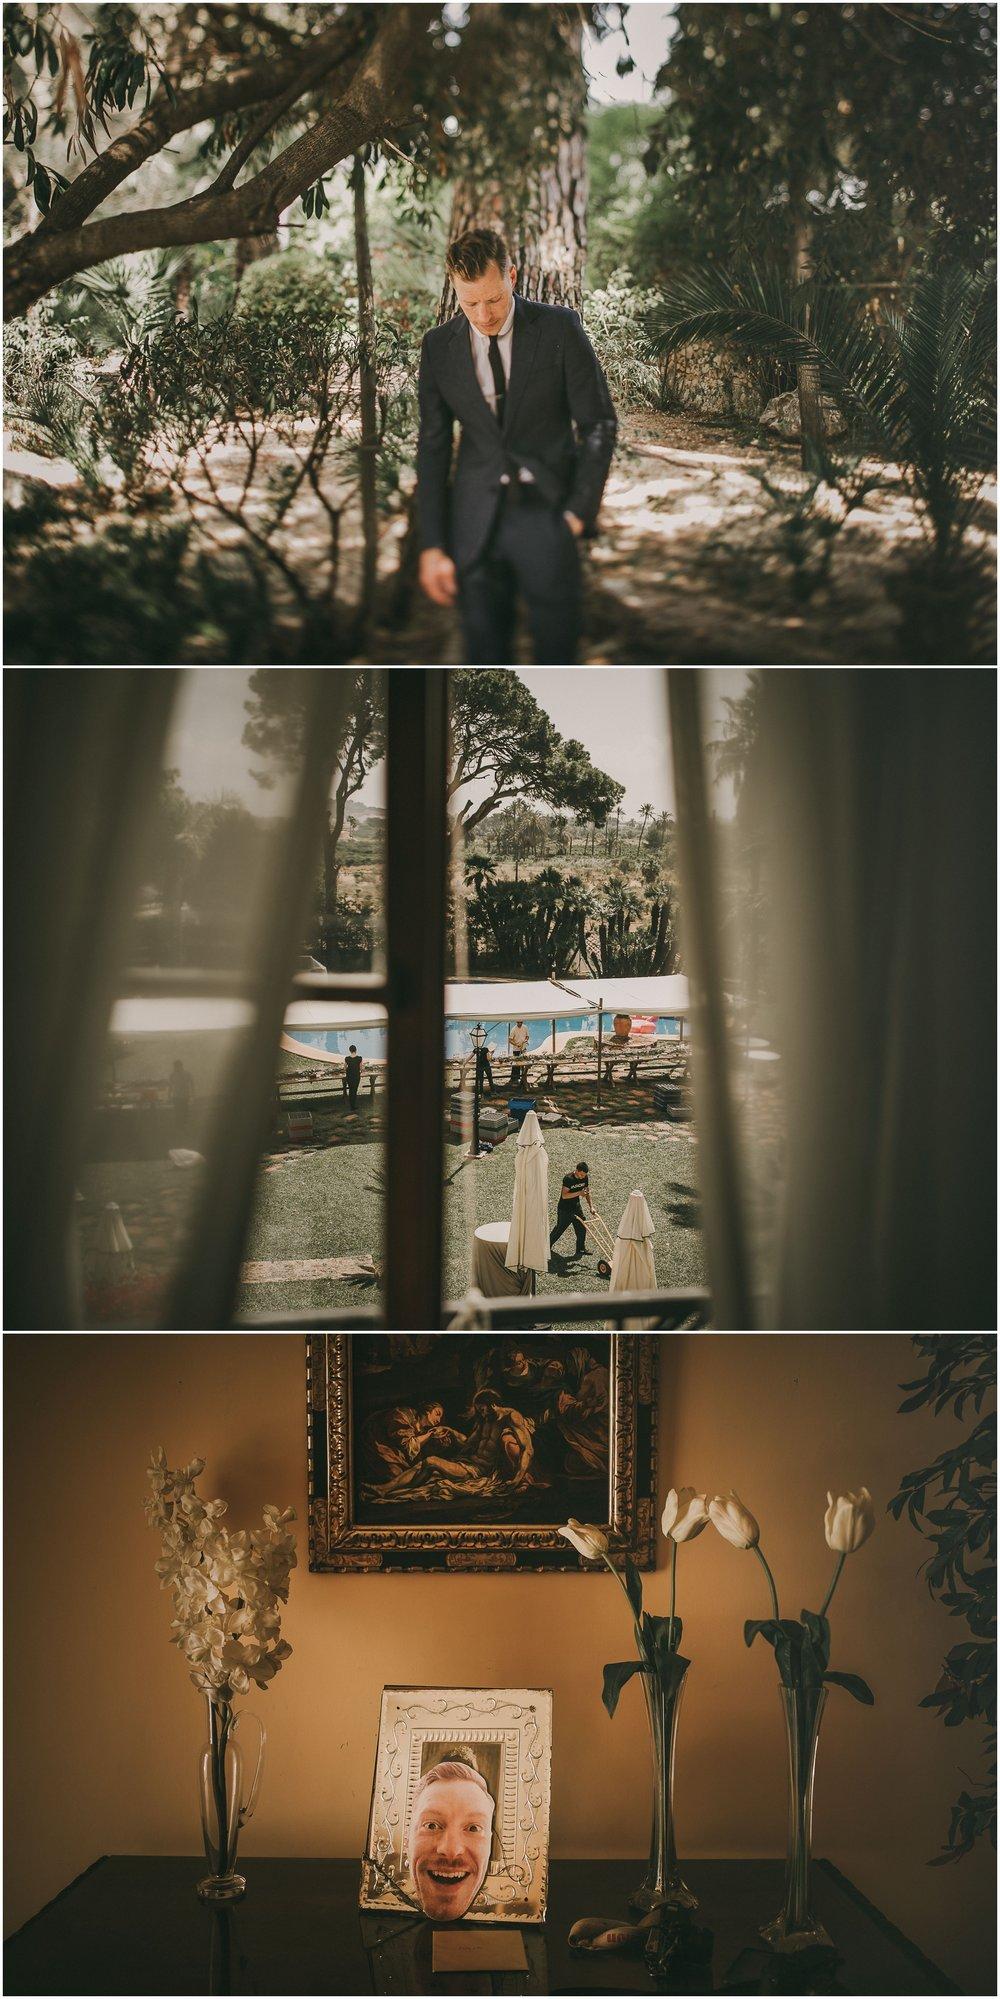 Emily & Joseph London wedding  by Pablo Laguia 046.JPG